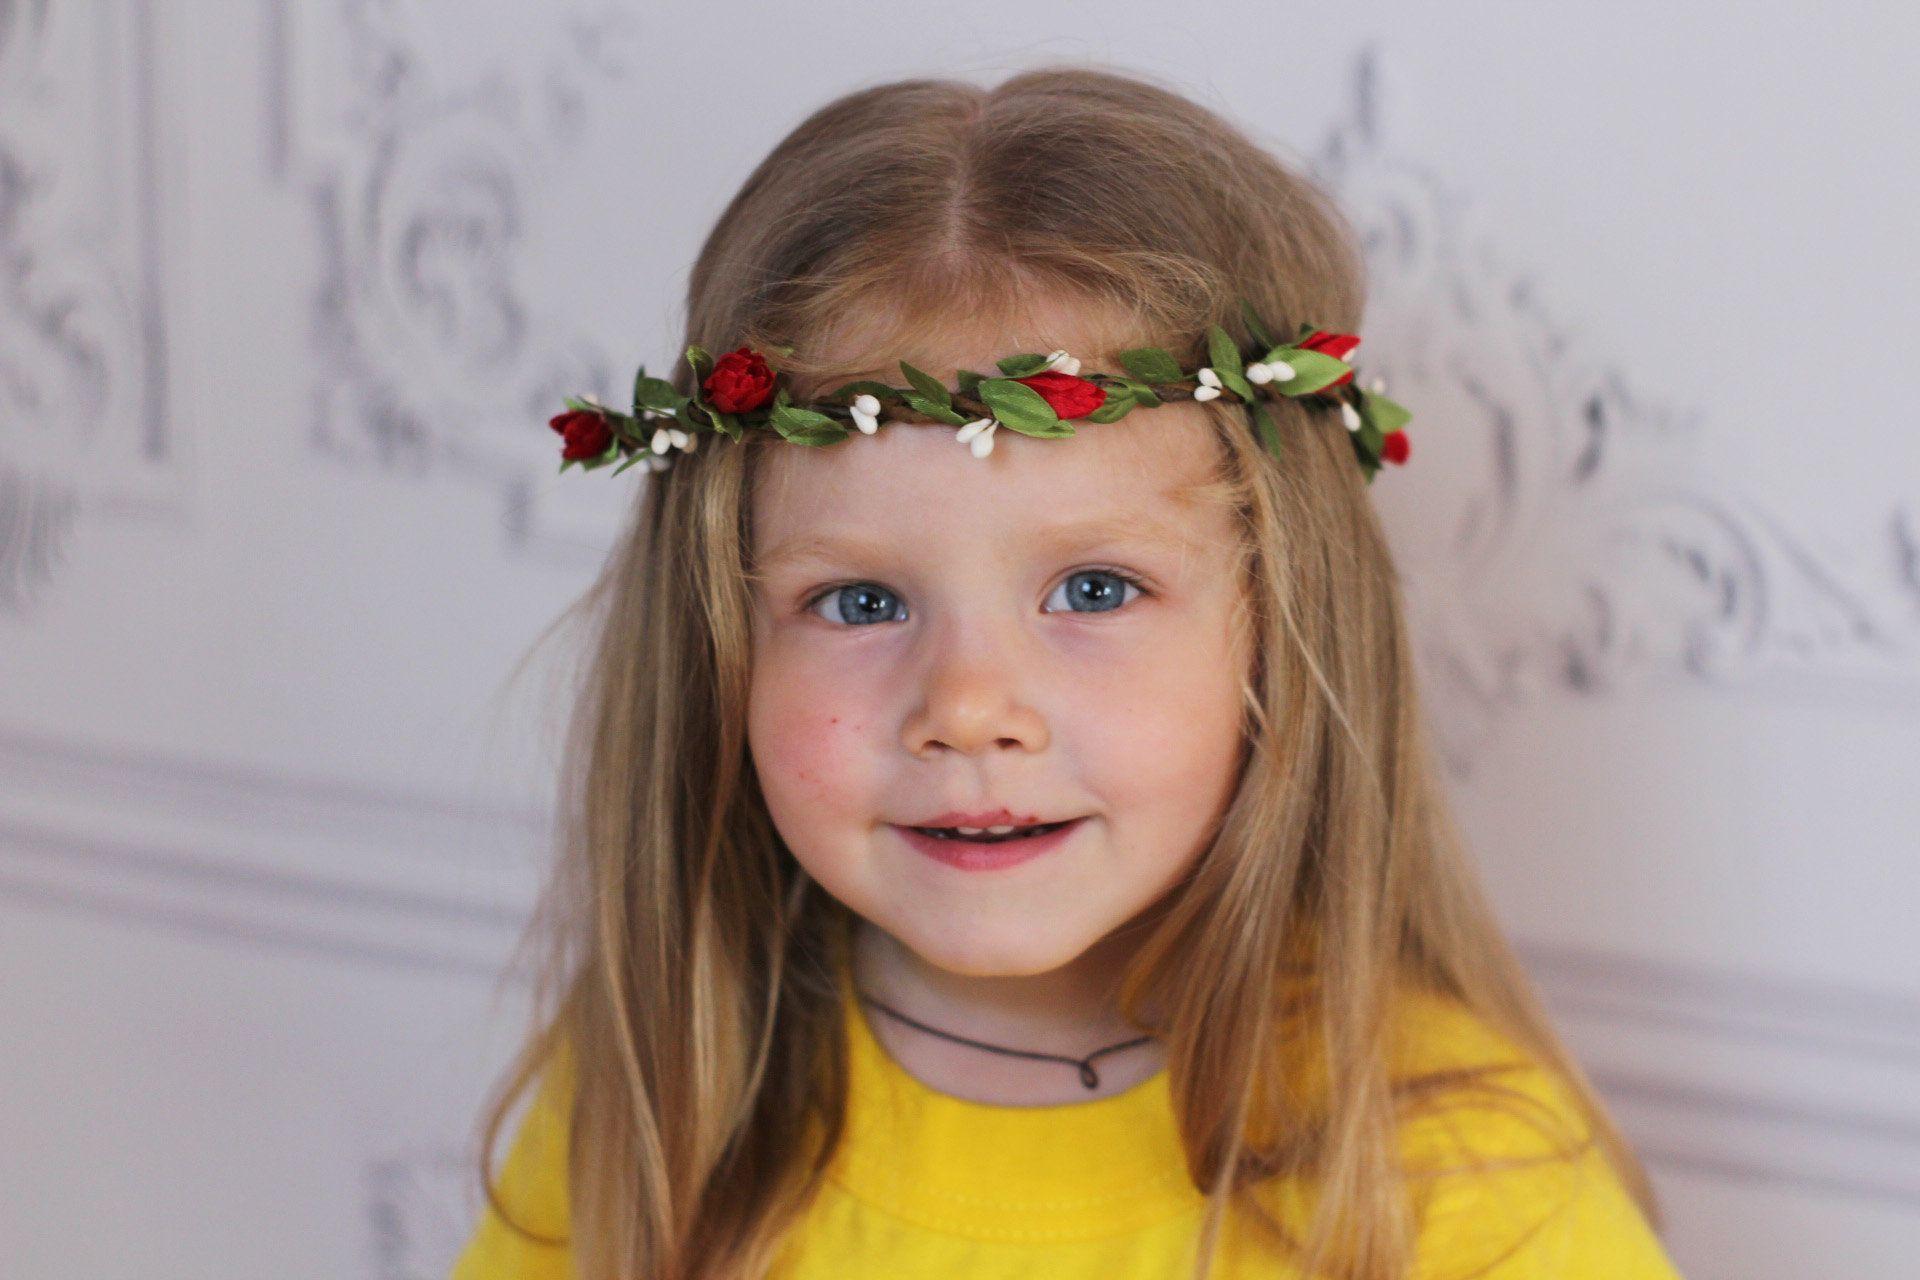 Flower girl white flower crown thin halo white and red flower flower girl white flower crown thin halo white and red flower headband for toddler girl white izmirmasajfo